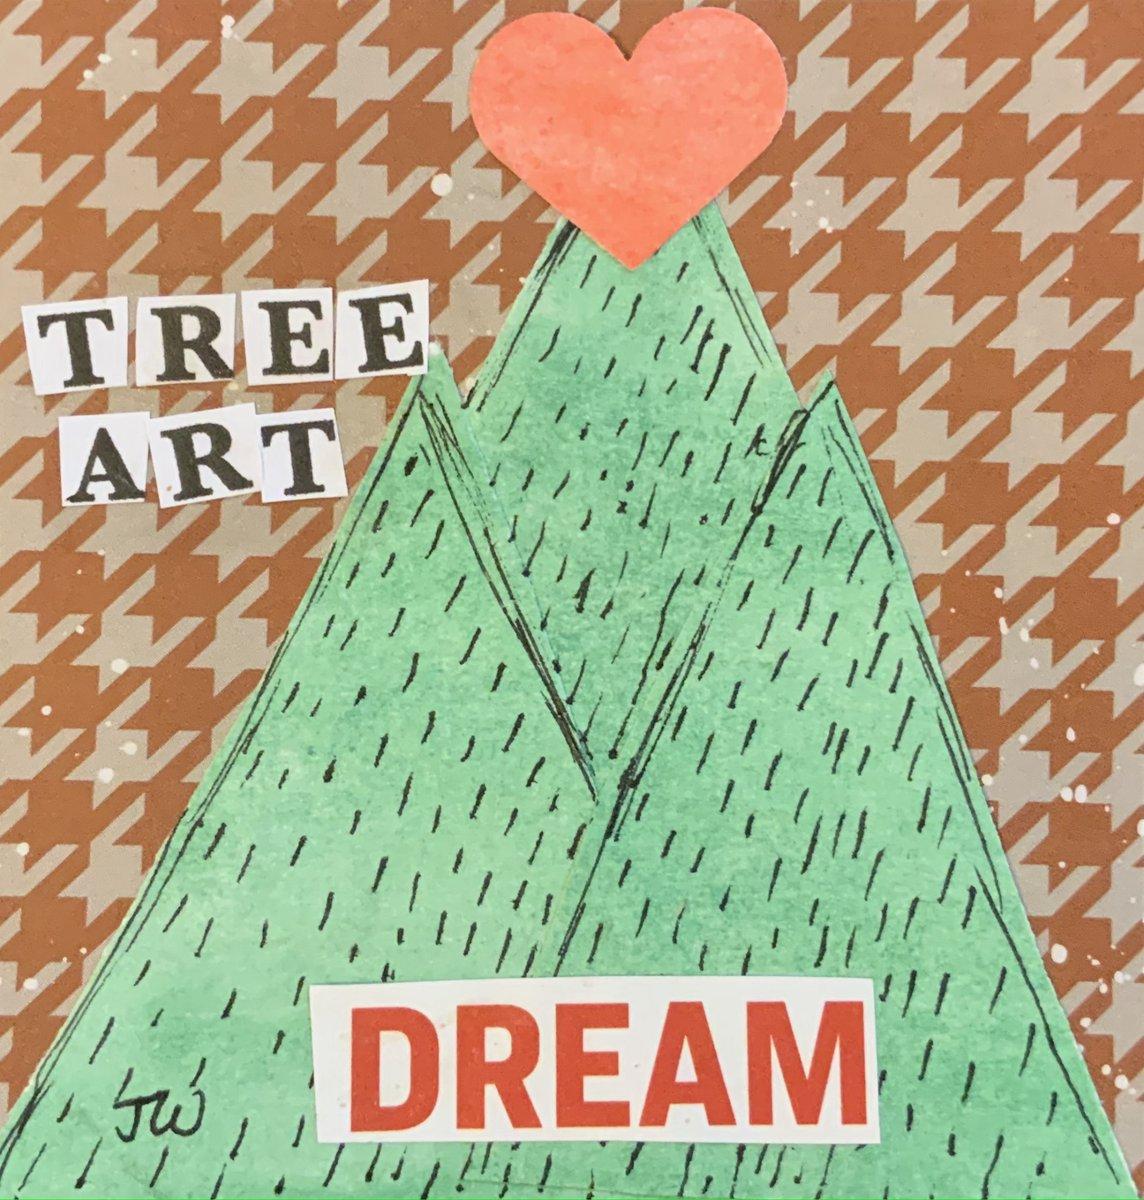 Tree a Day #treeaday #tree #treeart #treelove #art #patterns #dream #heart #greentrees #firtrees #brown #seriesart #nature #forest #wednesdayart #smallart #january2021art #paperart #watercolor #collage #abstractart #janicewilliamsart